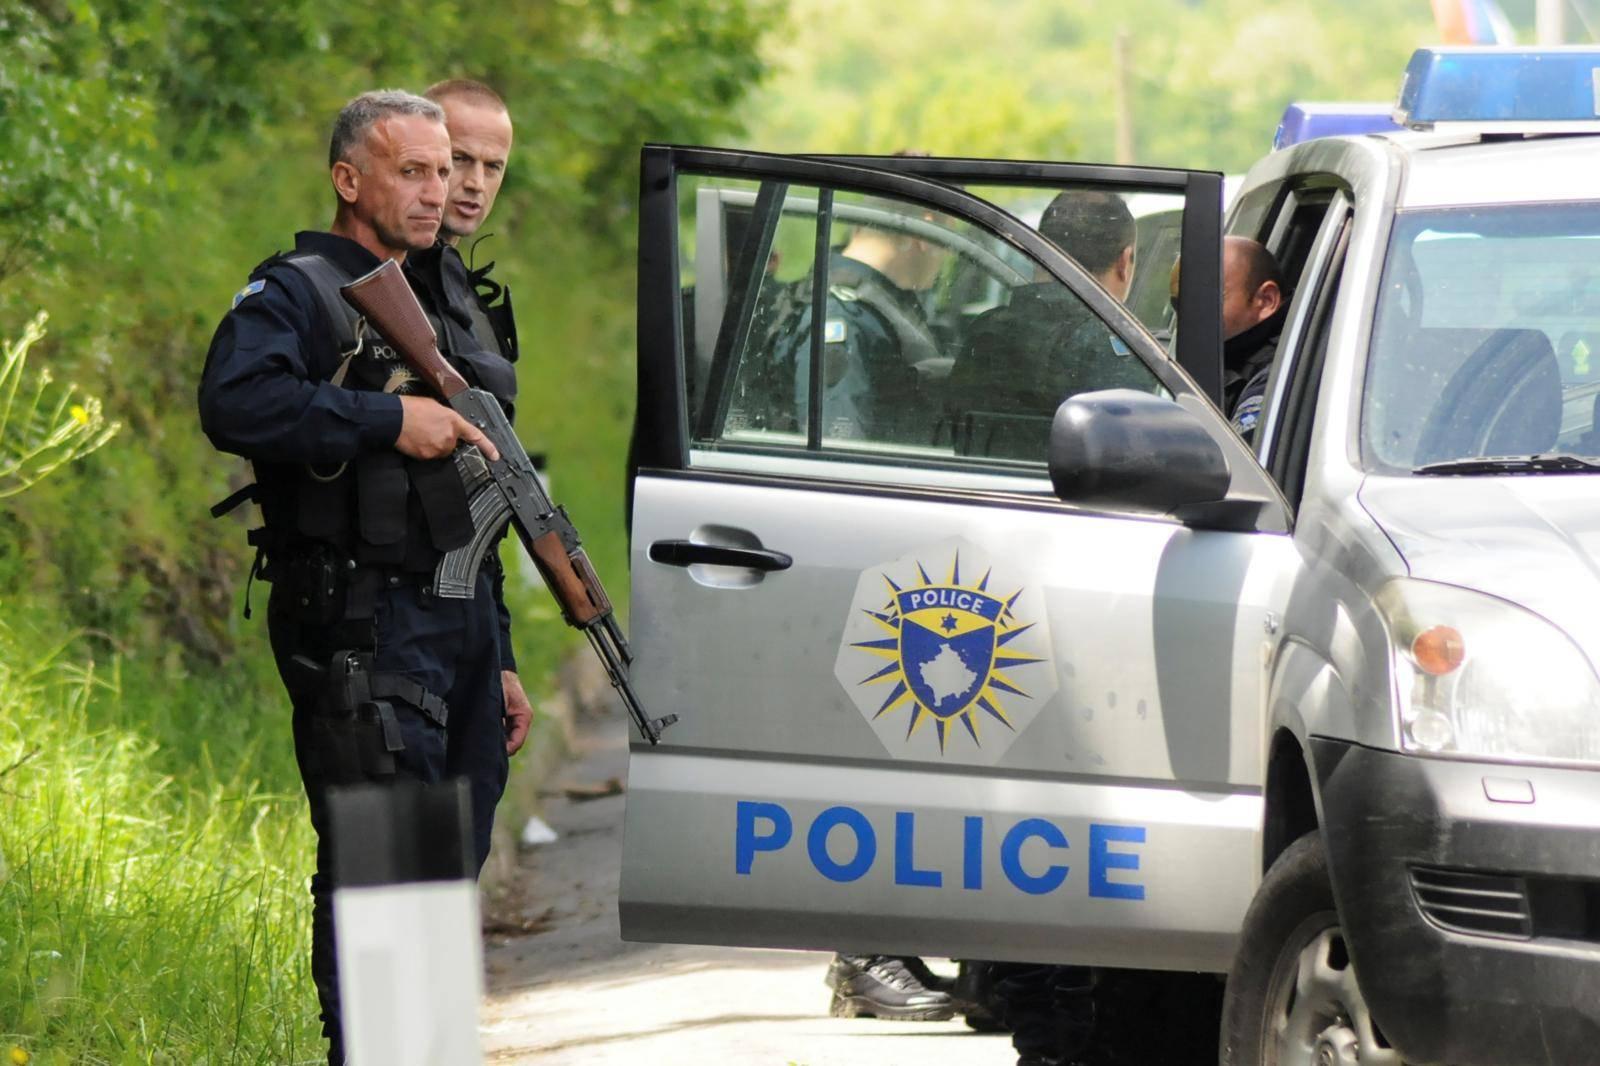 Kosovo police secure the area near of Zubin Potok